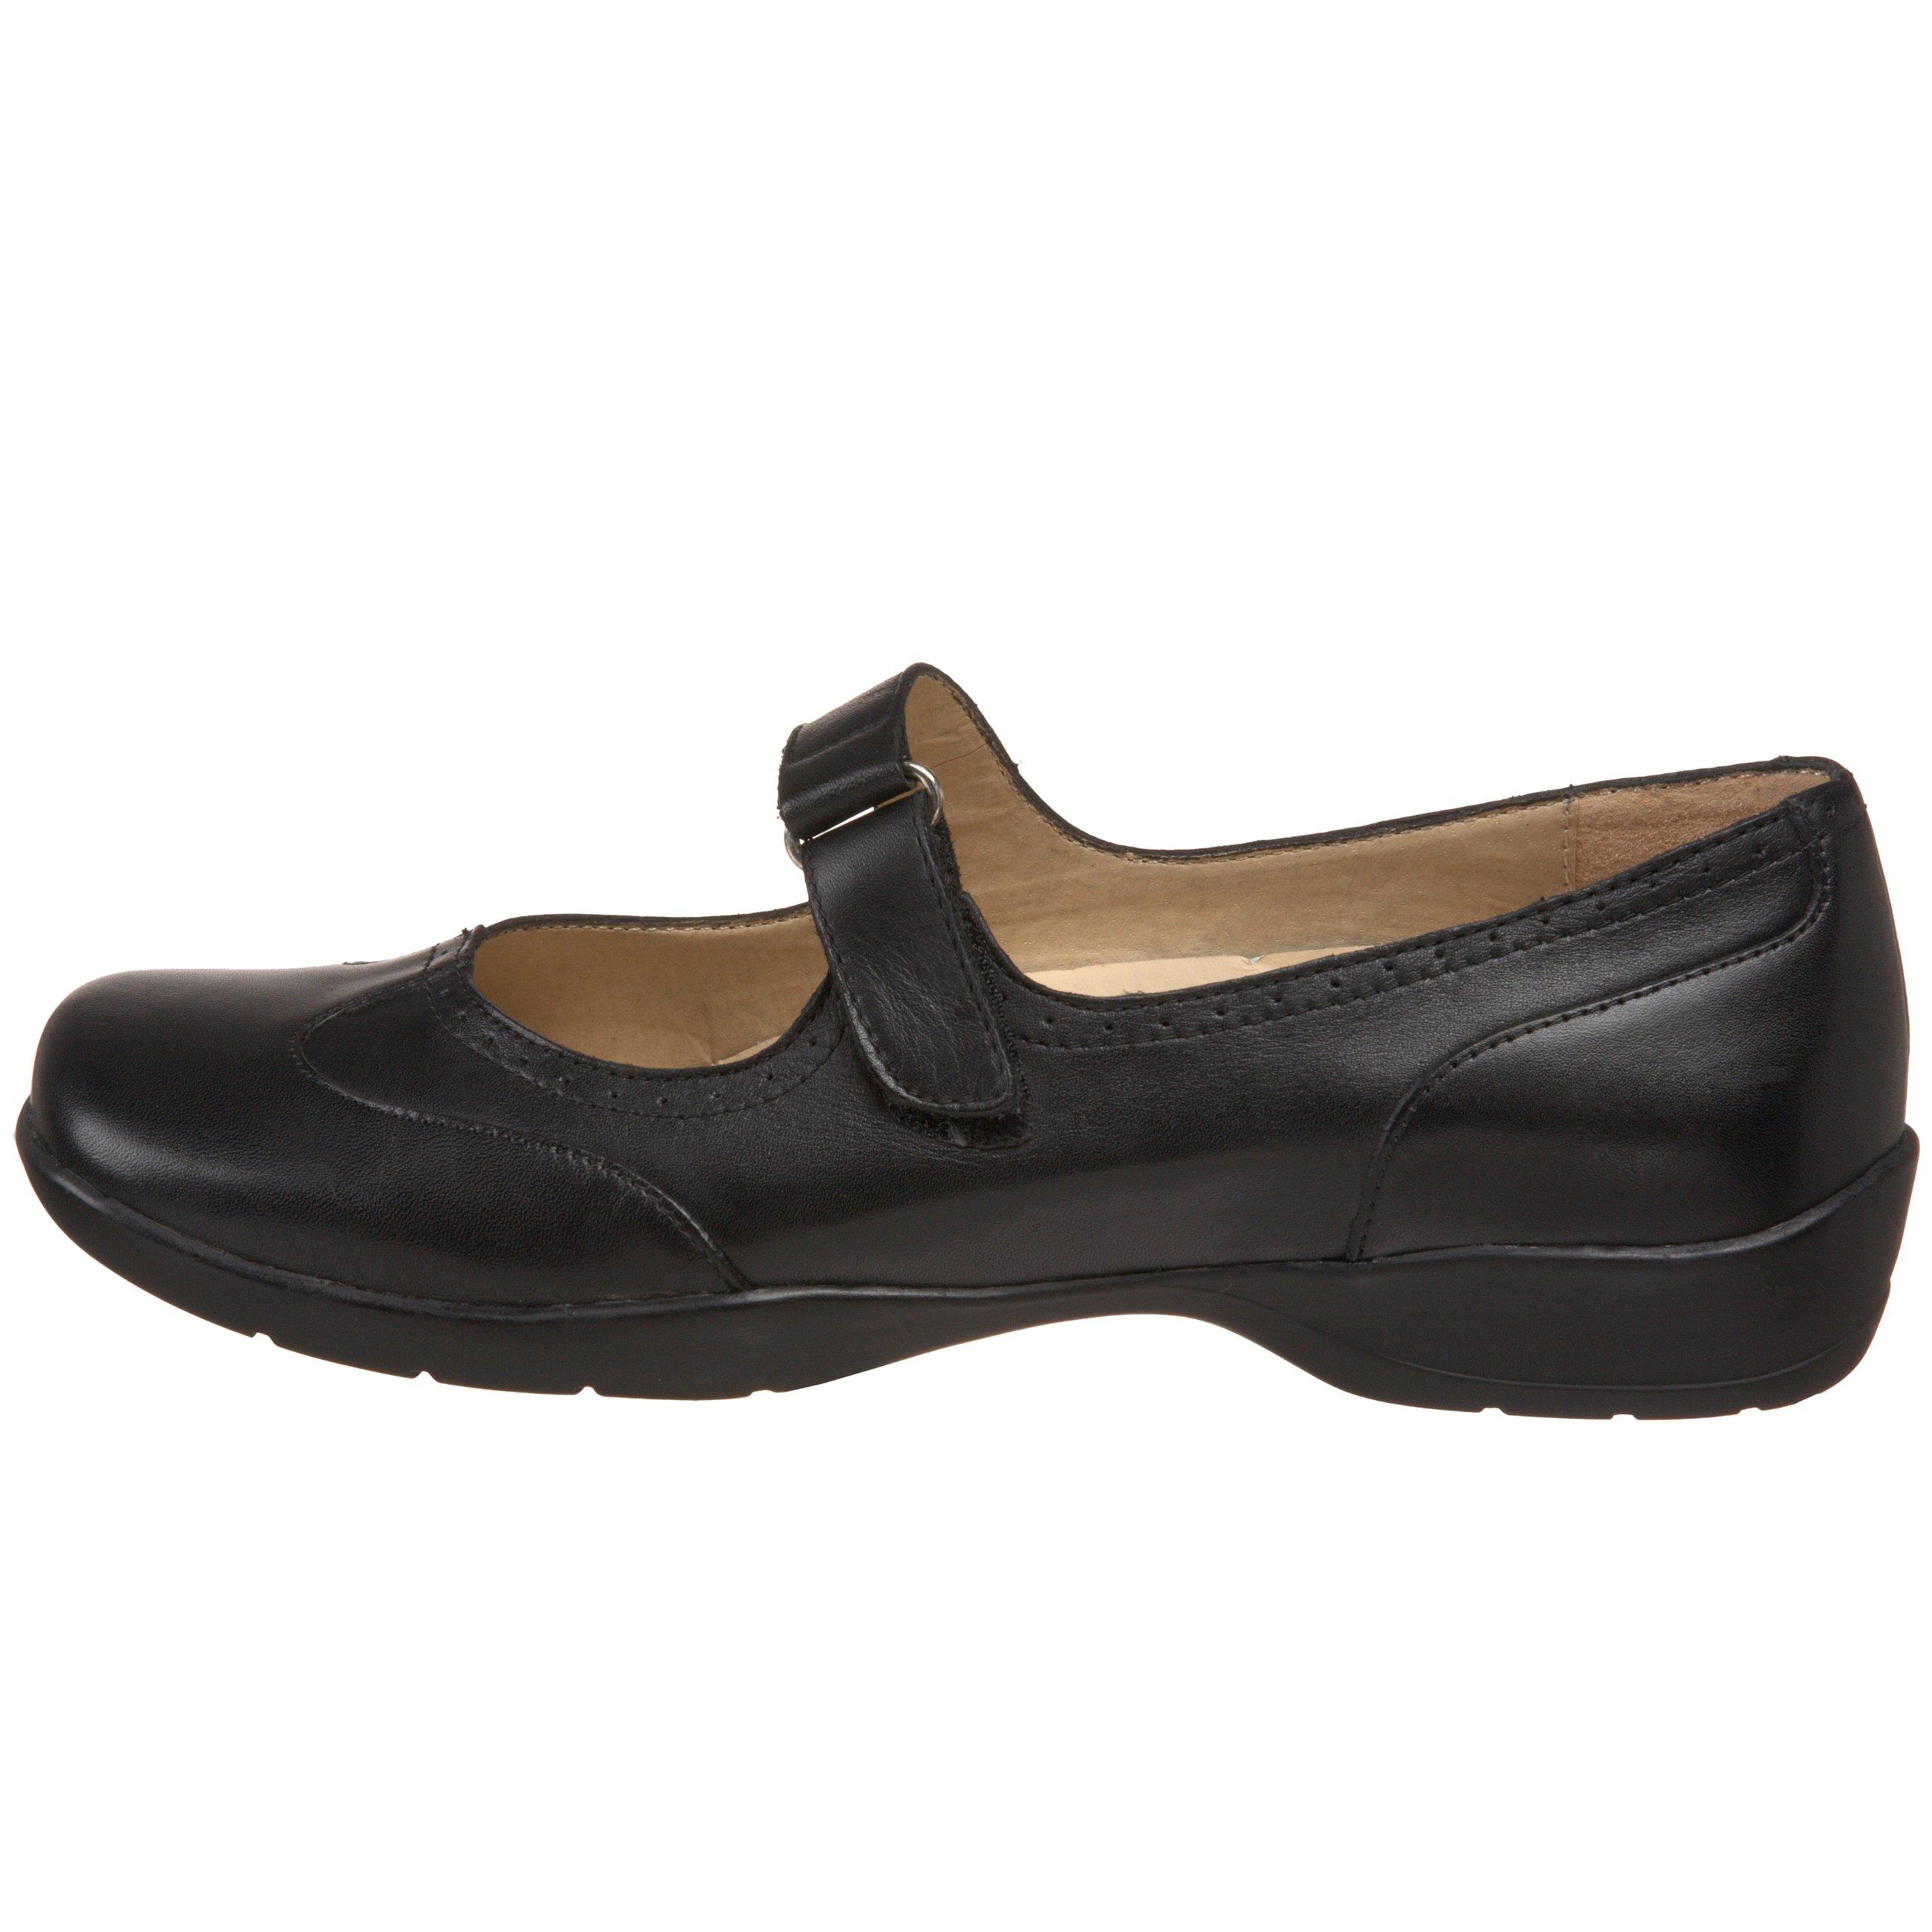 Drew Shoe Women's Isabel Mary Jane,Black Leather,6 W US by Drew Shoe (Image #5)